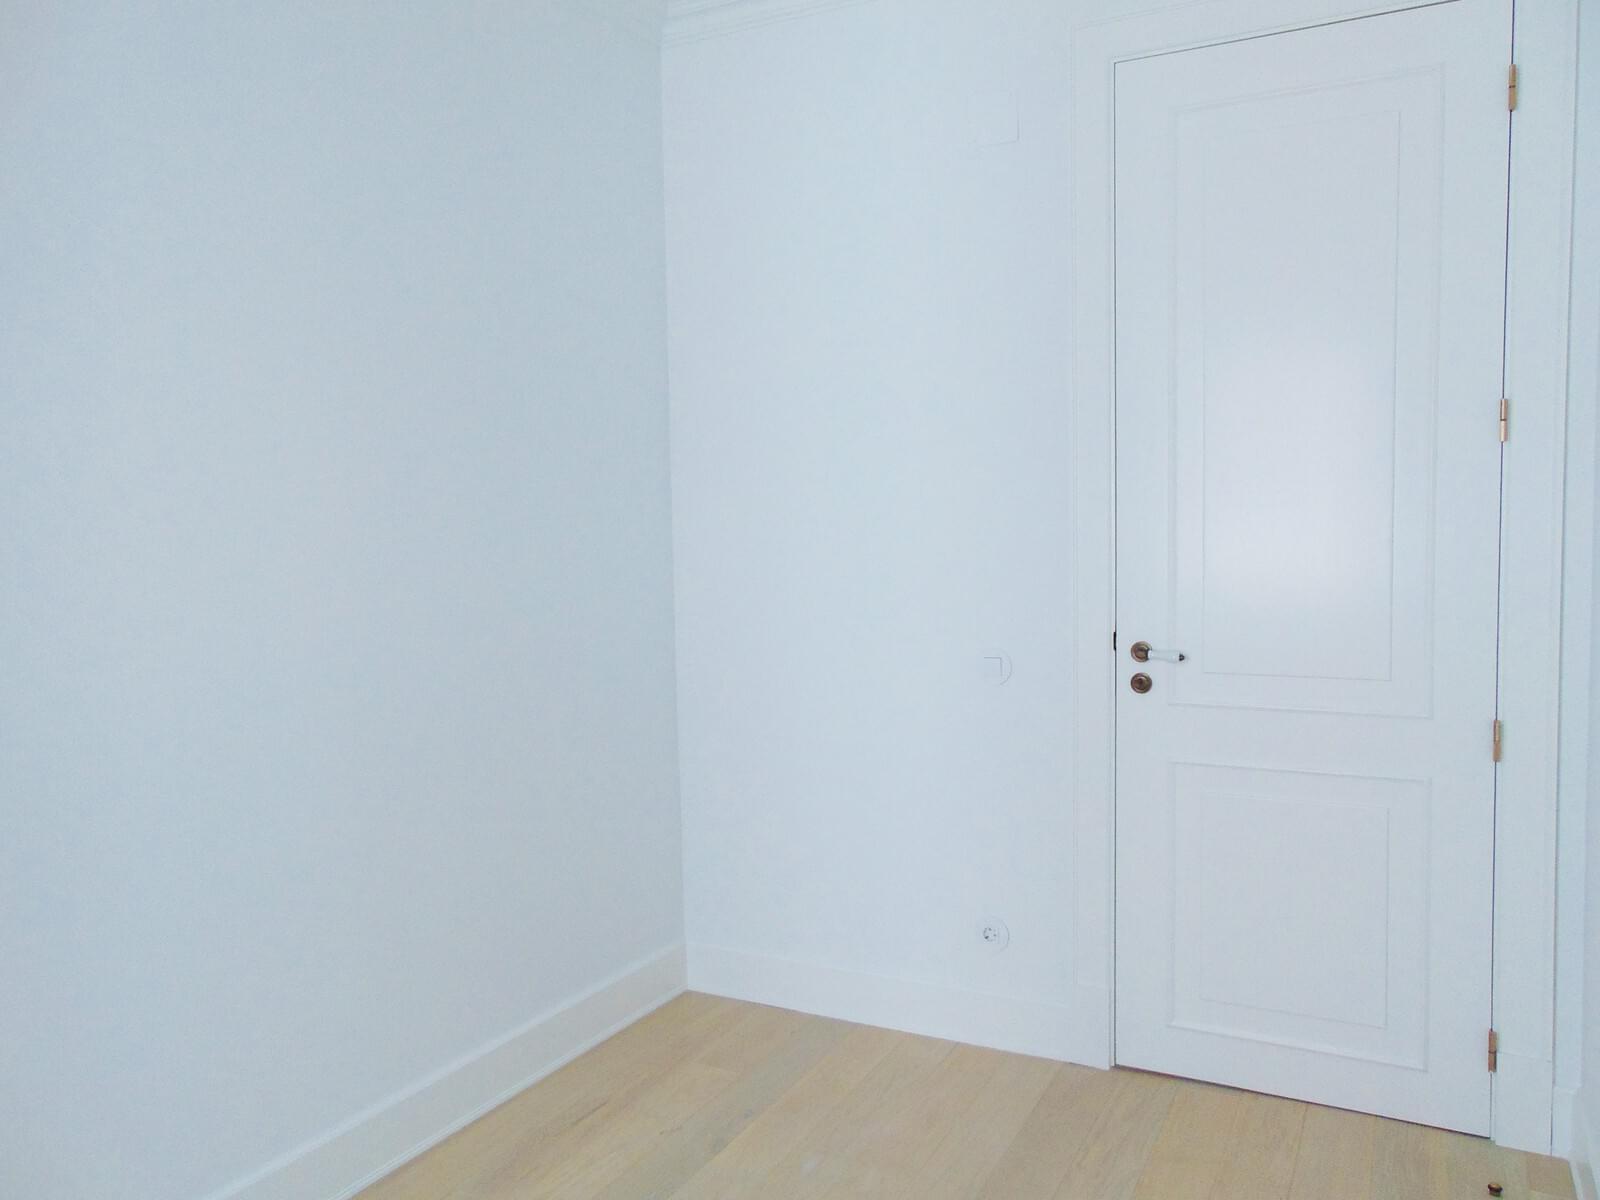 pf18152-apartamento-t2-lisboa-b62dda4f-1012-45b4-a1d6-faa6a169e5a0